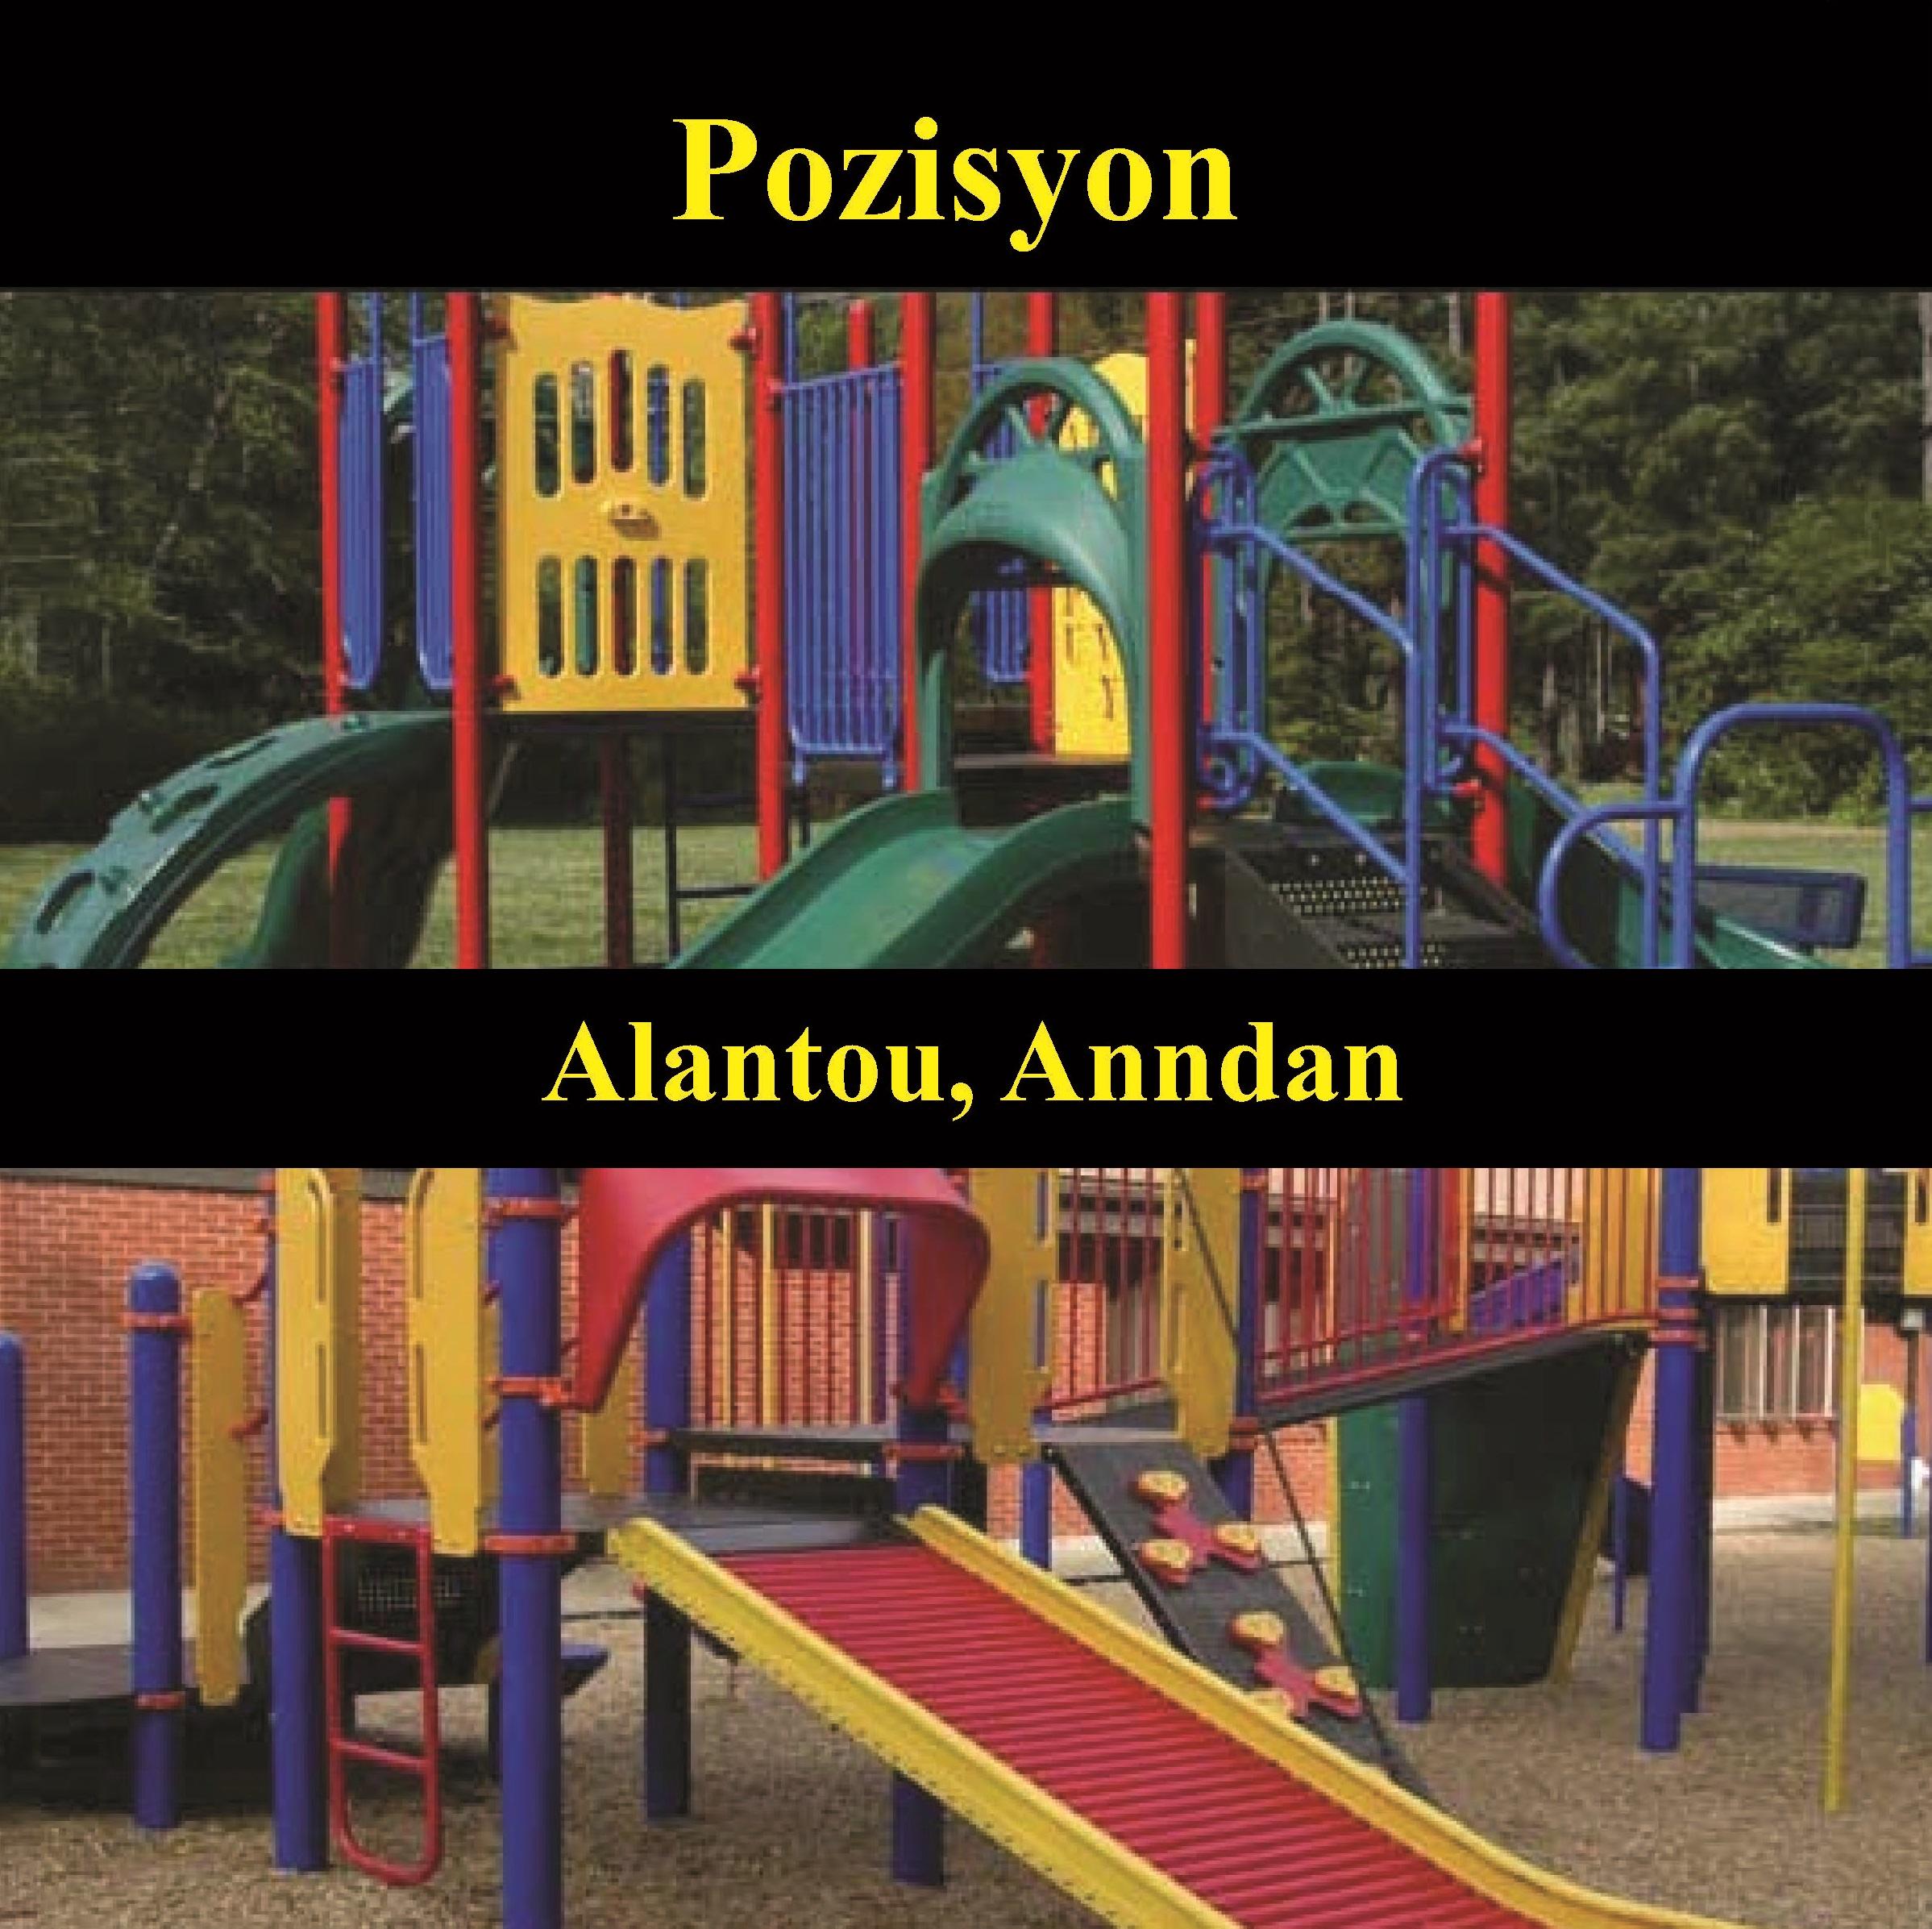 Alantou, Anndan